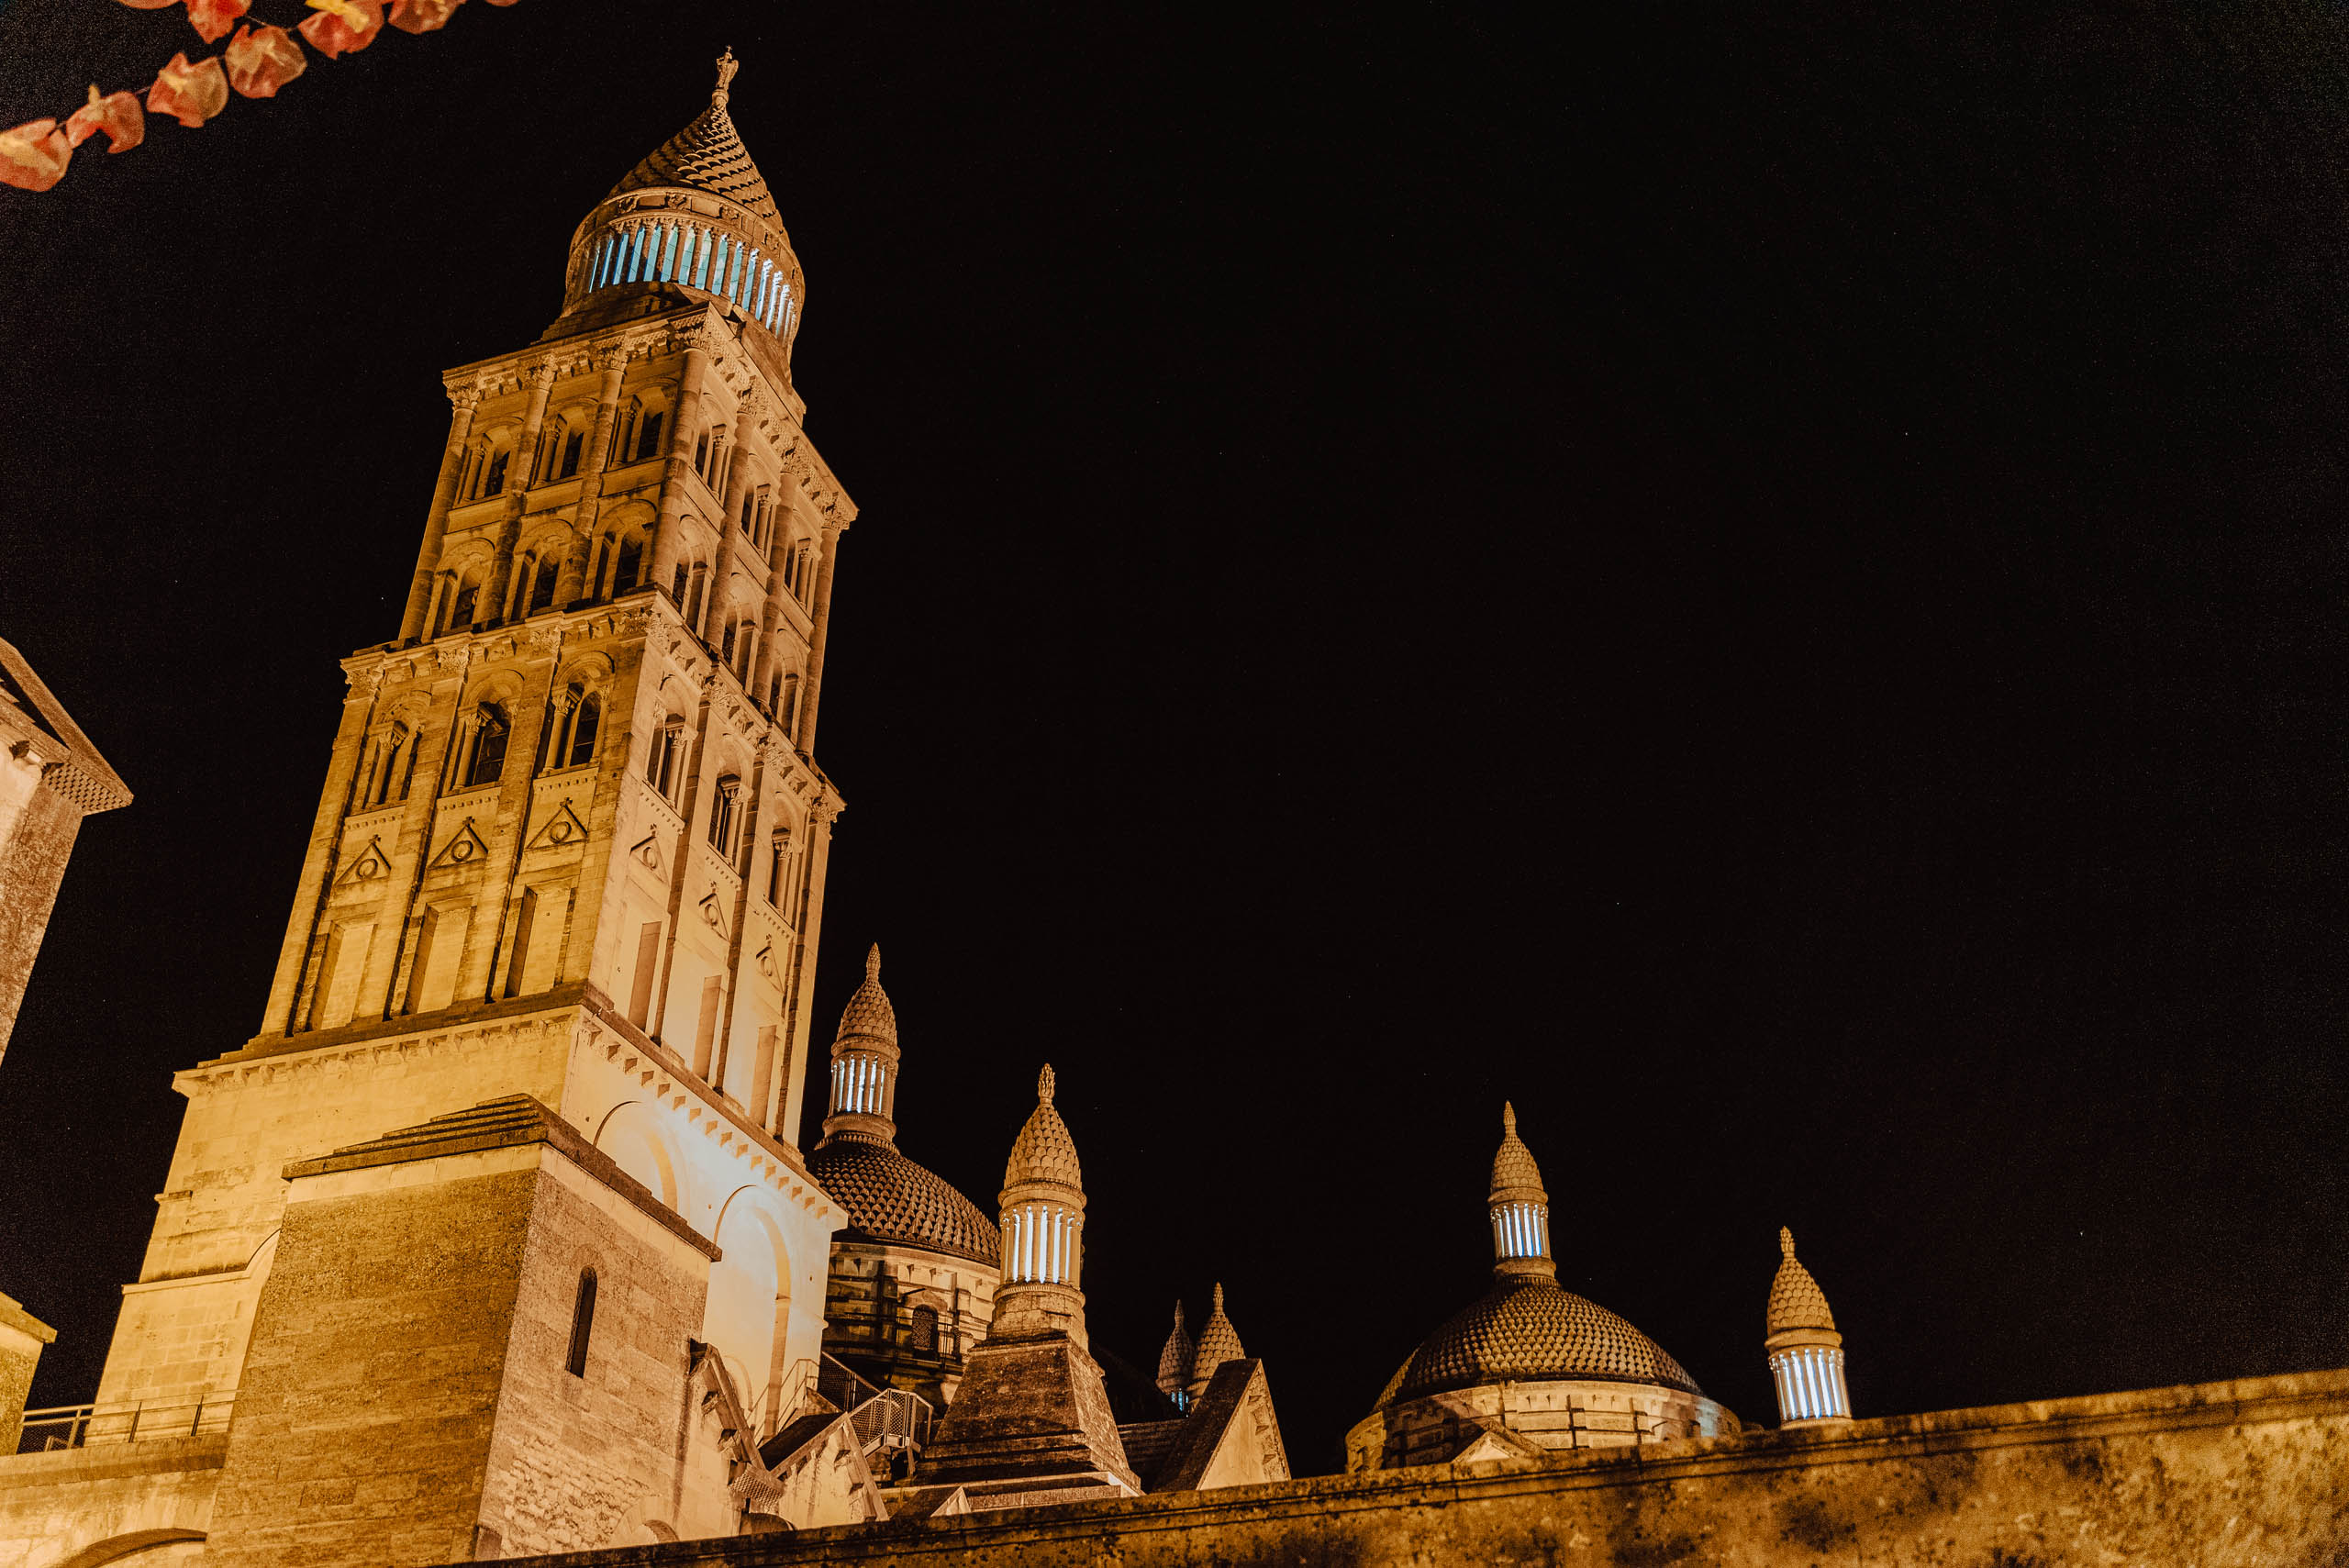 Katedra św. Fronta w Périgueux